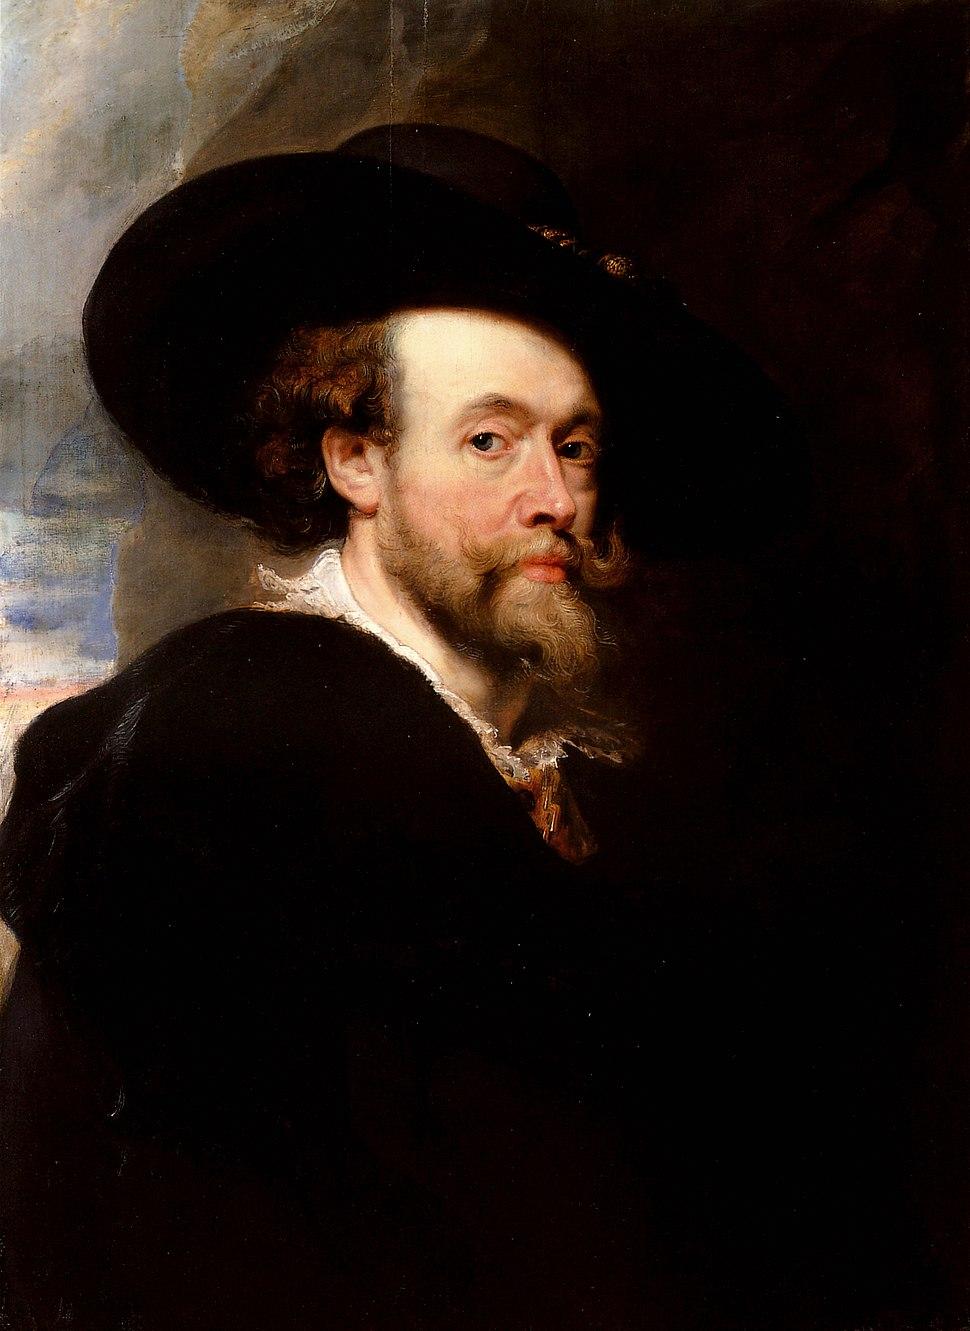 Rubens Self-portrait 1623